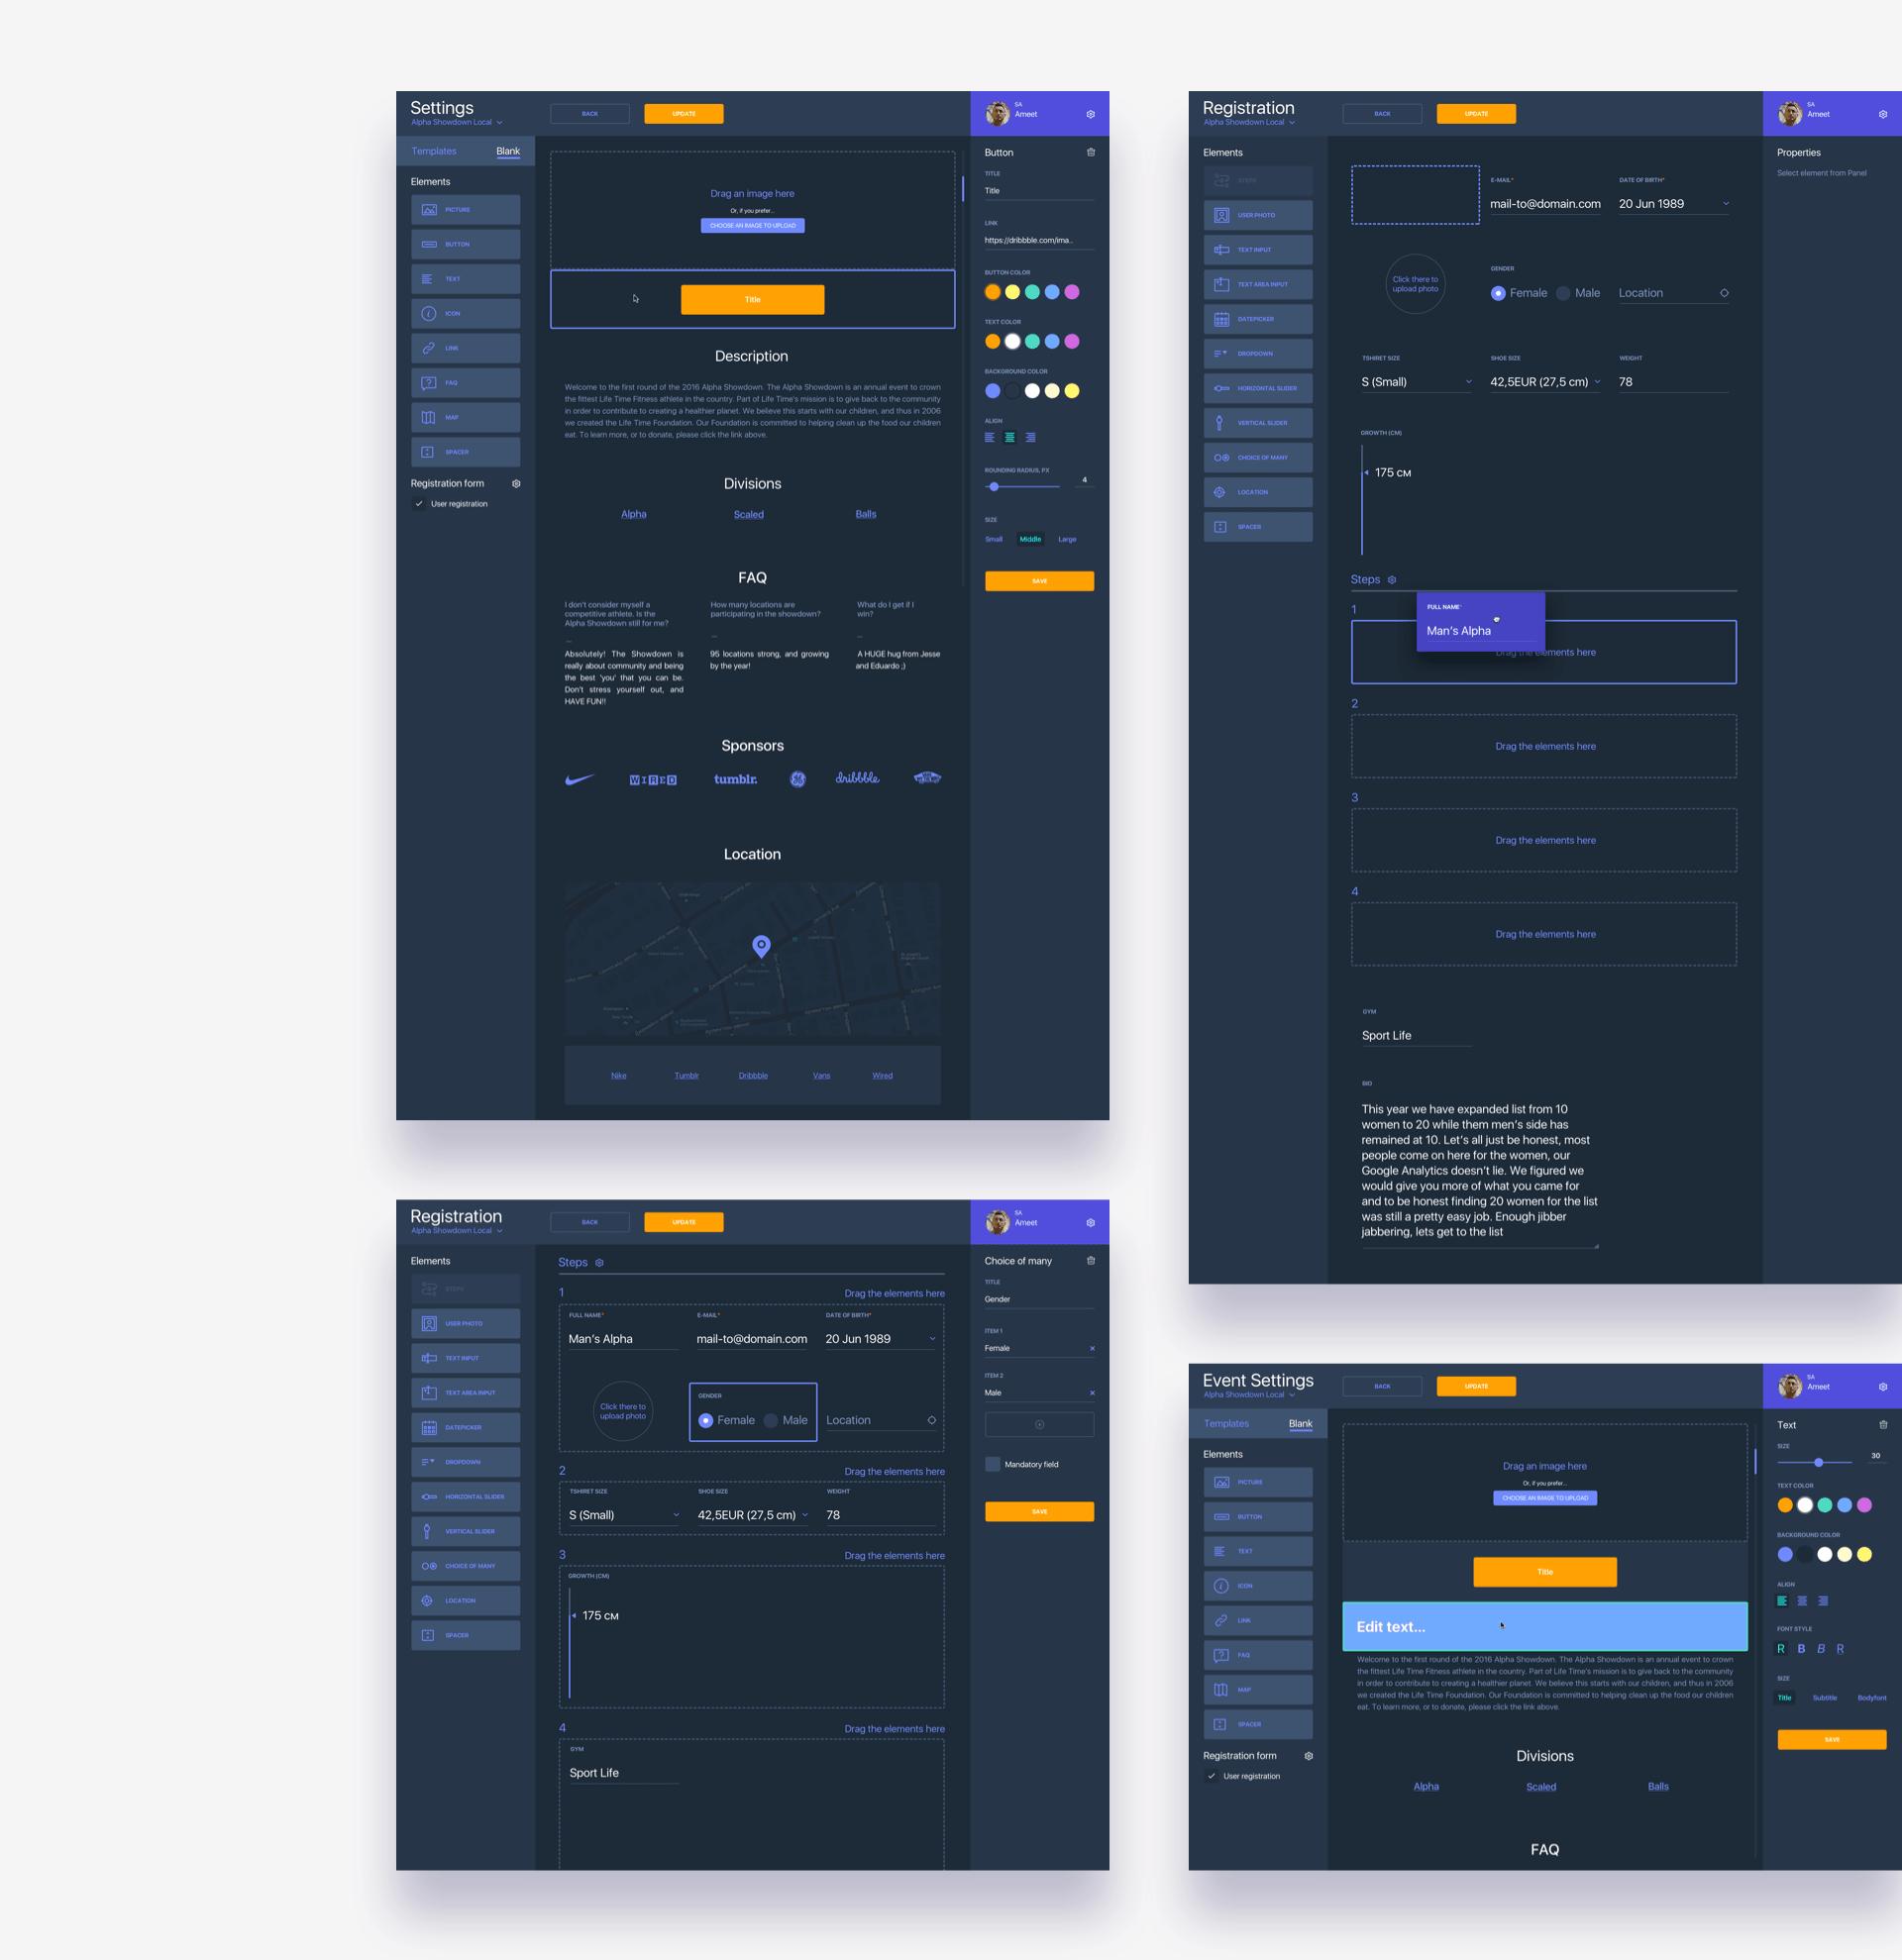 crossfit_desktop_4